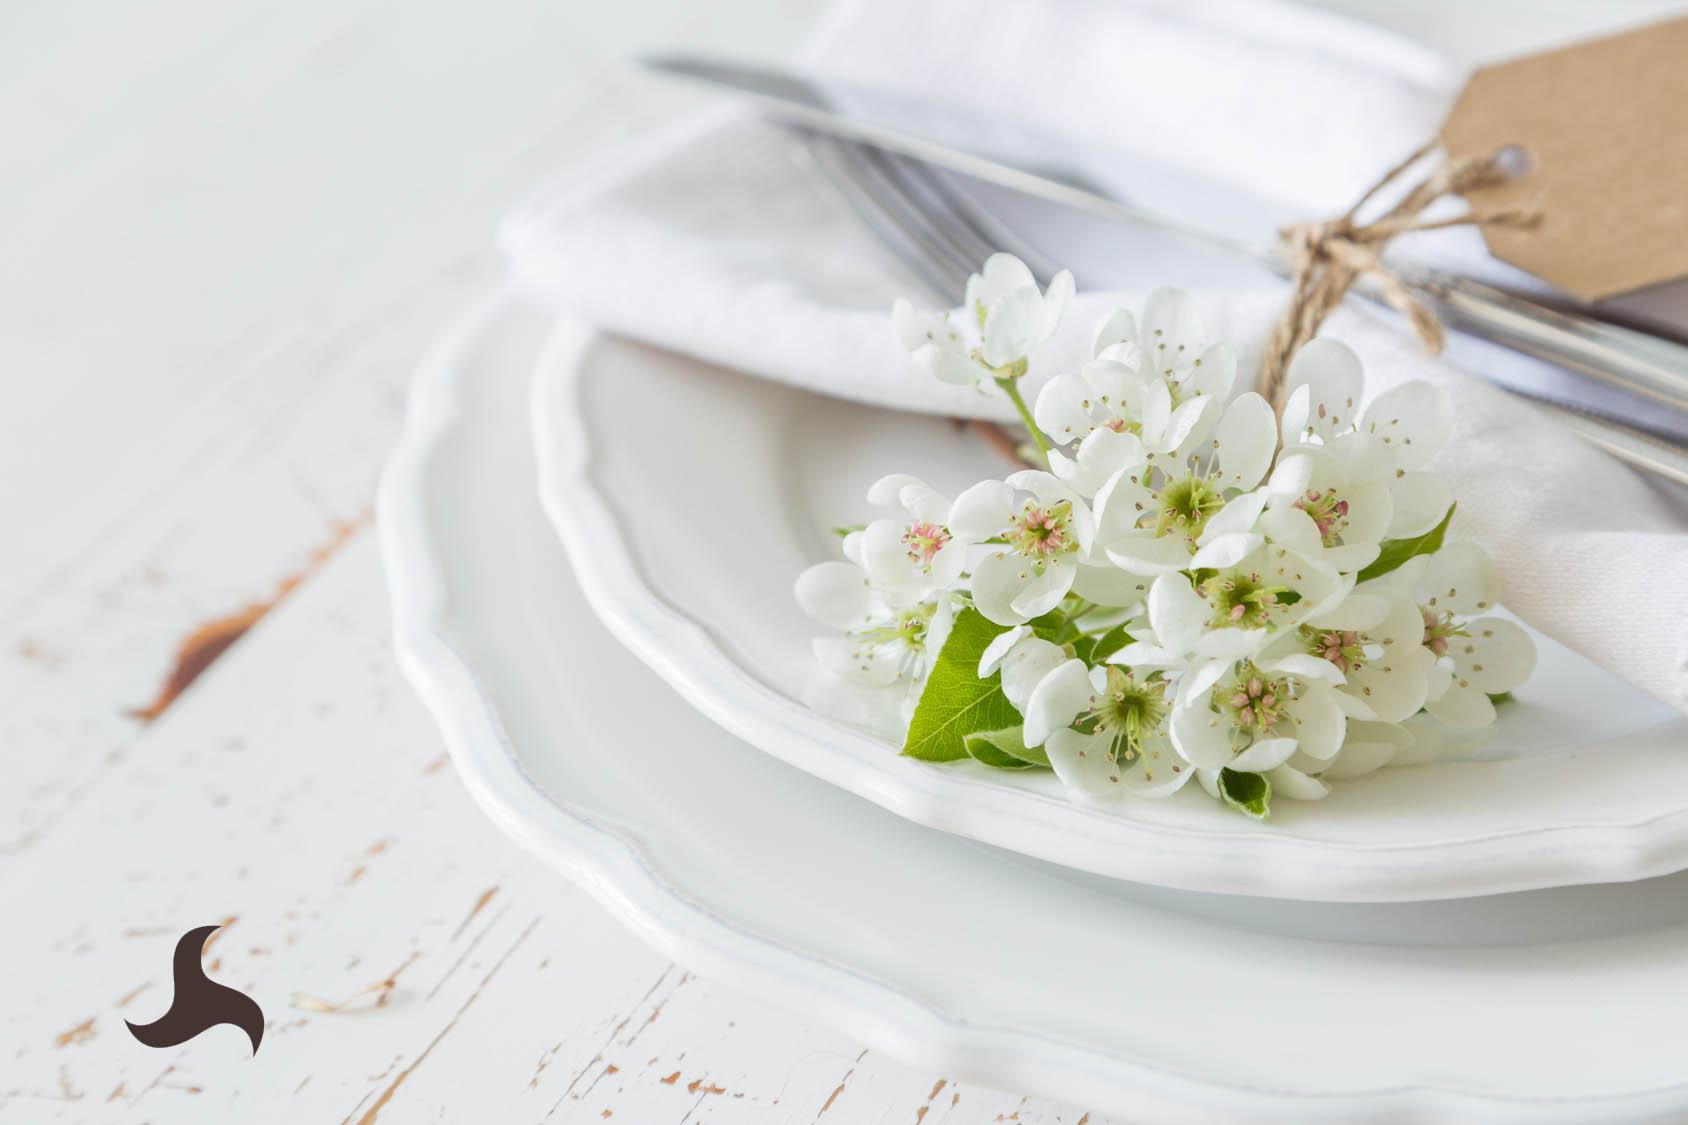 Mesas manteles y servilletas primavera La Pajarita